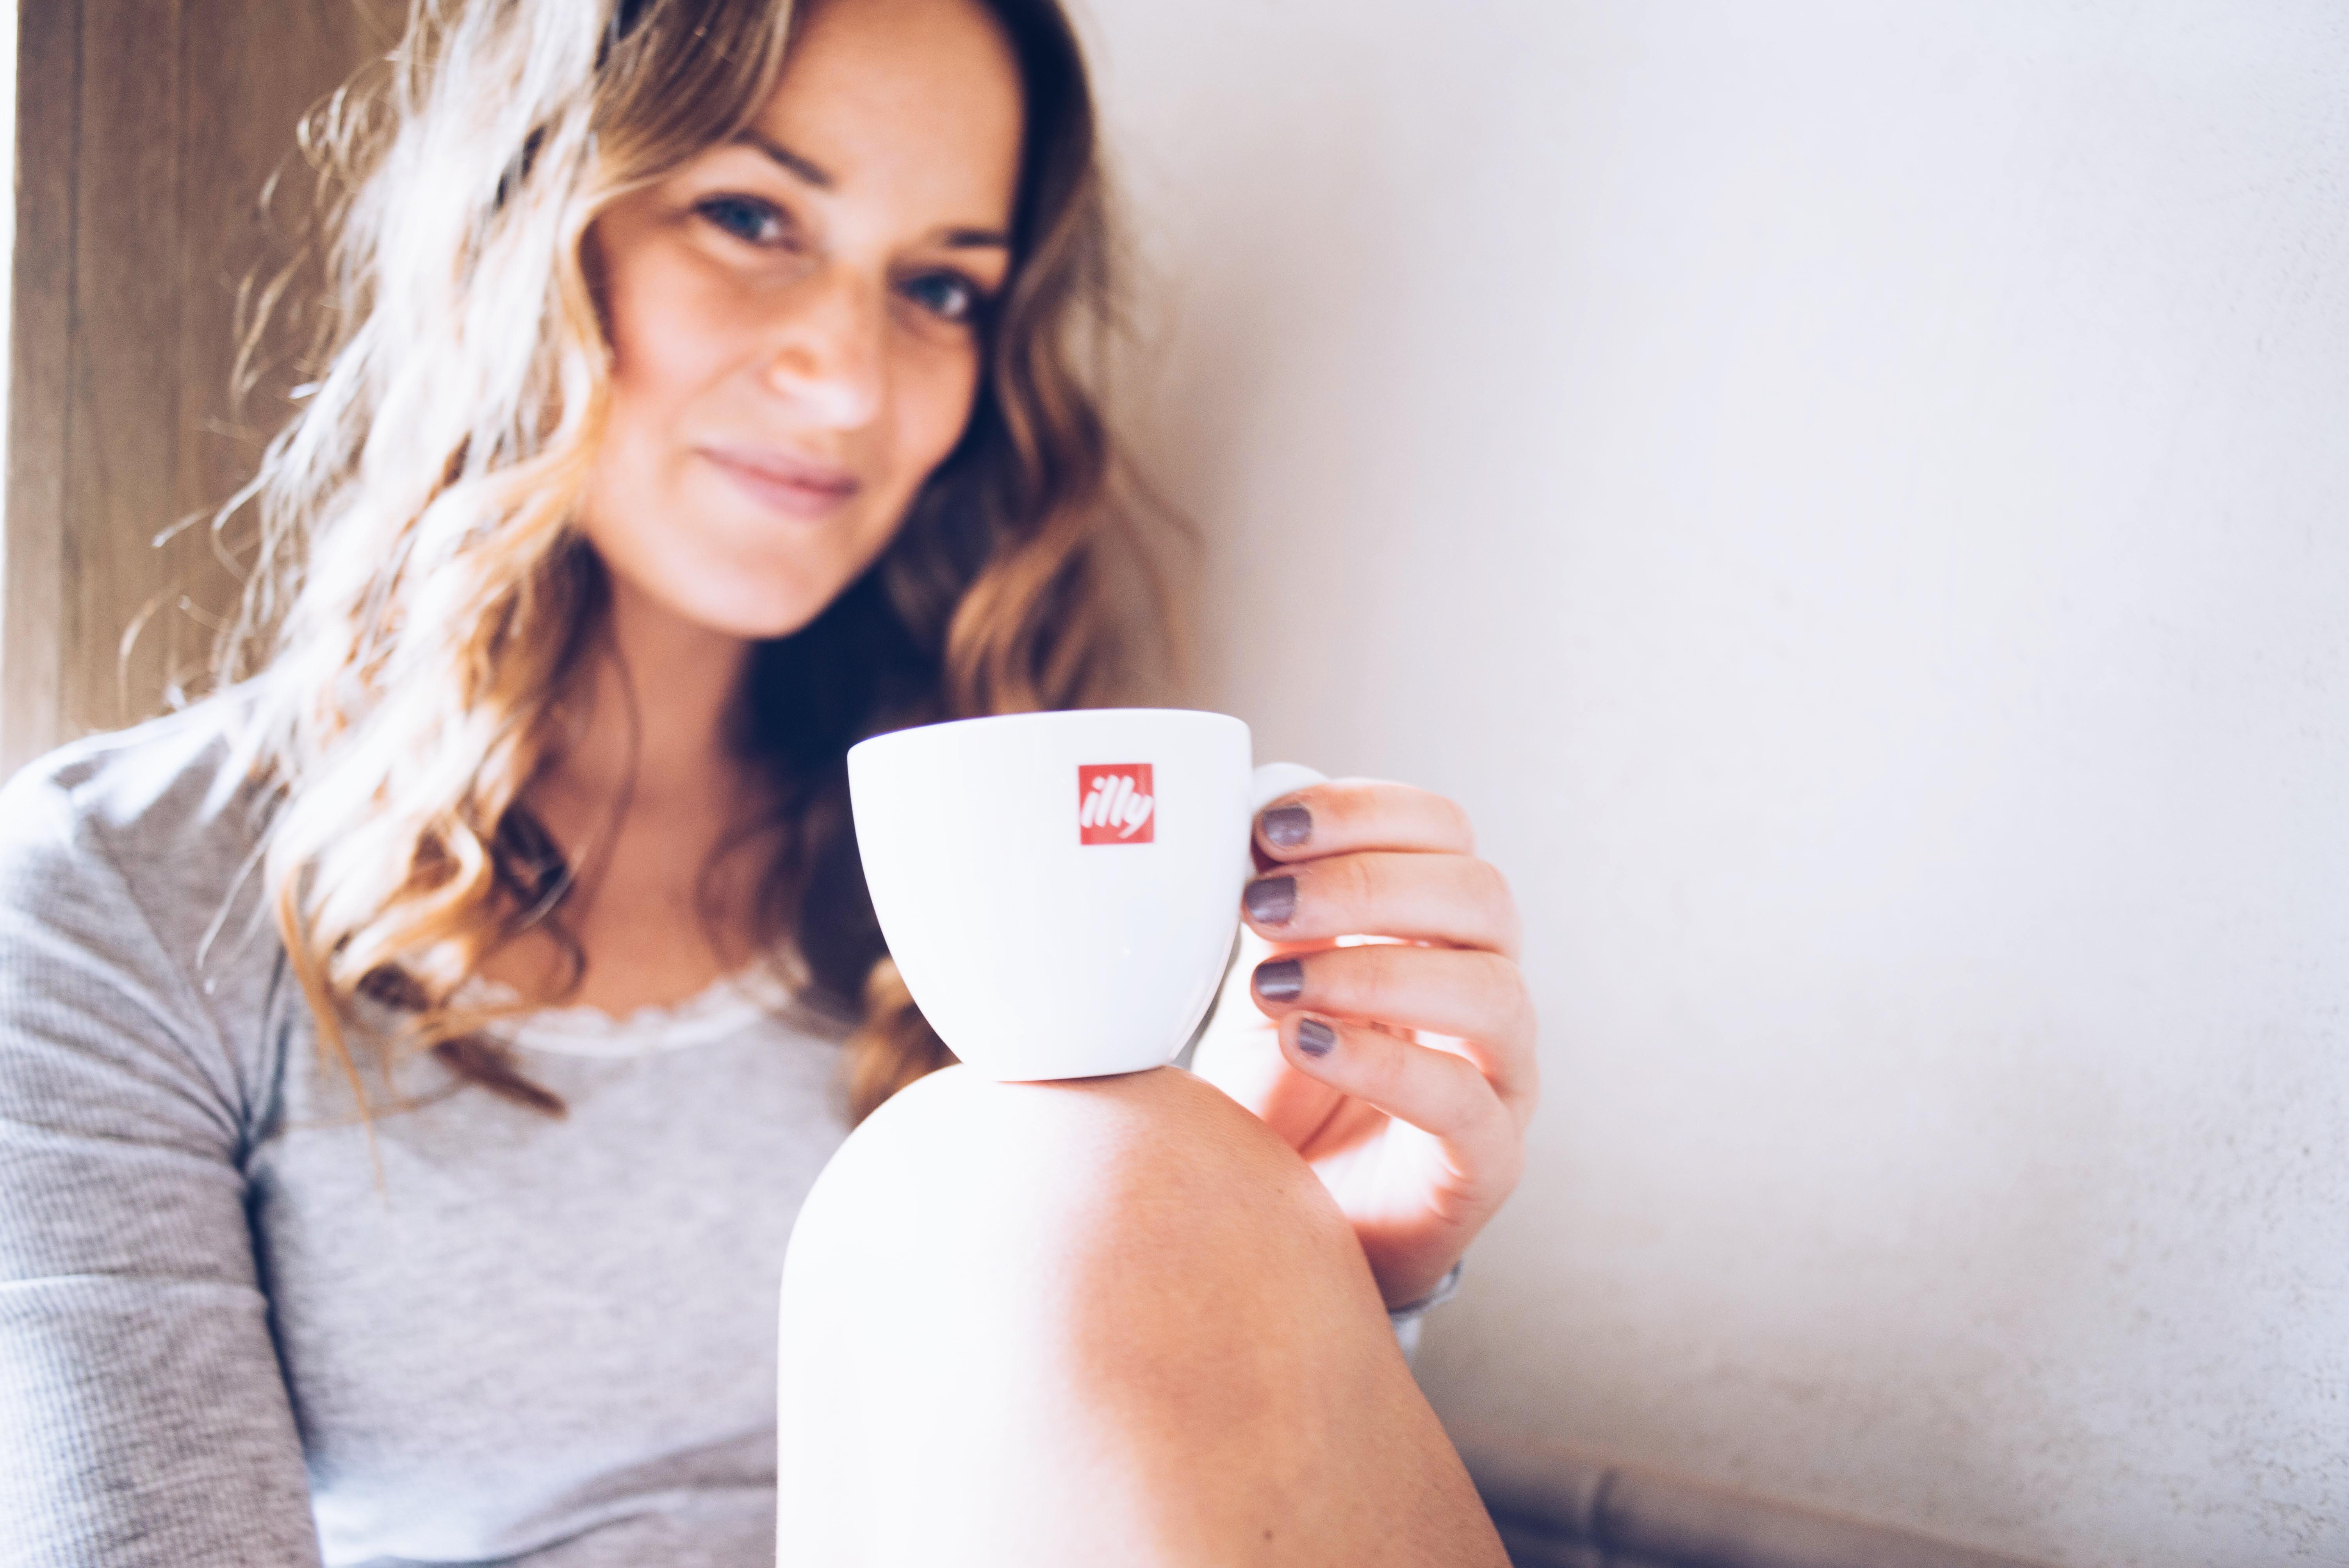 illy, illythuis, illyNL, koffie, coffee, cosy, morning, ochtend, bakkie, hunkemoller, hunkemöller, pyjama, sloffen, blogger, xmariekie